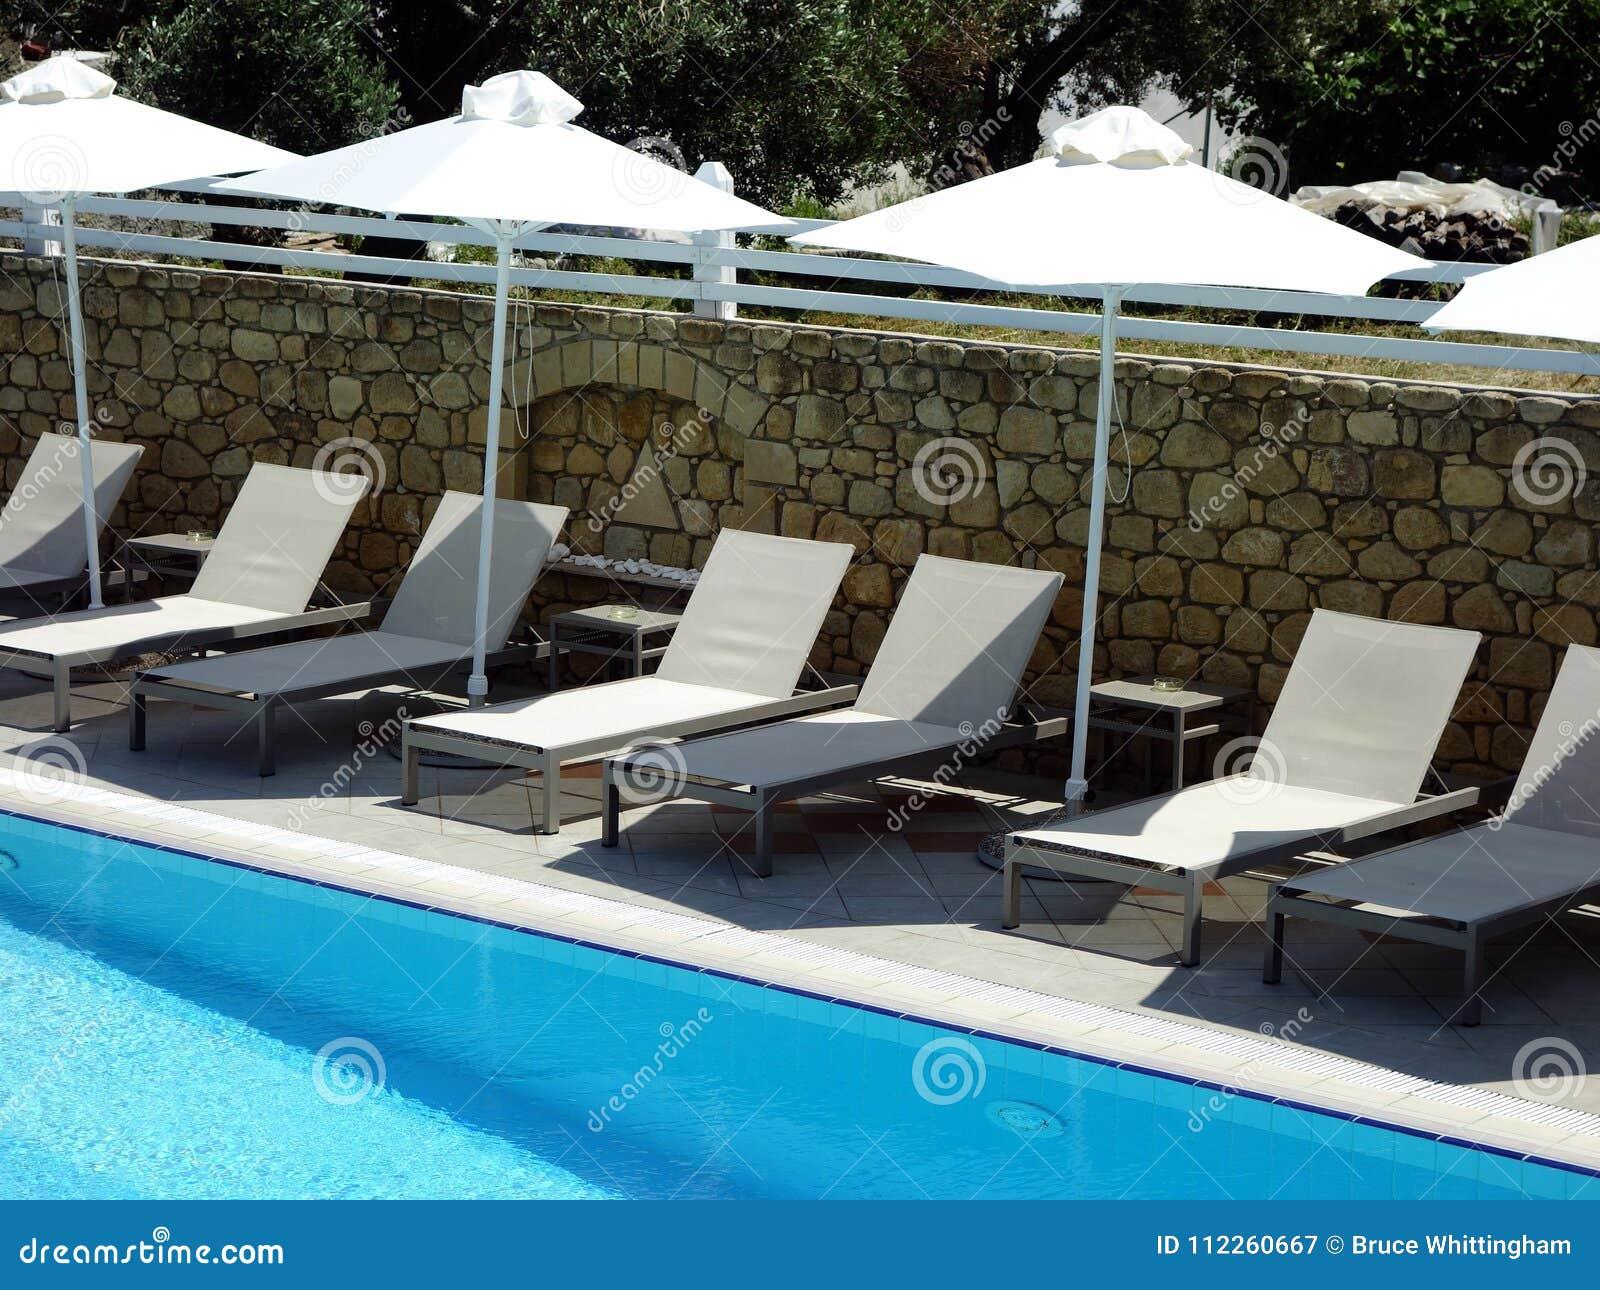 Hotel Swimming Pool Sun Beds And Umbrellas Stock Image Image Of Umbrellas Pool 112260667